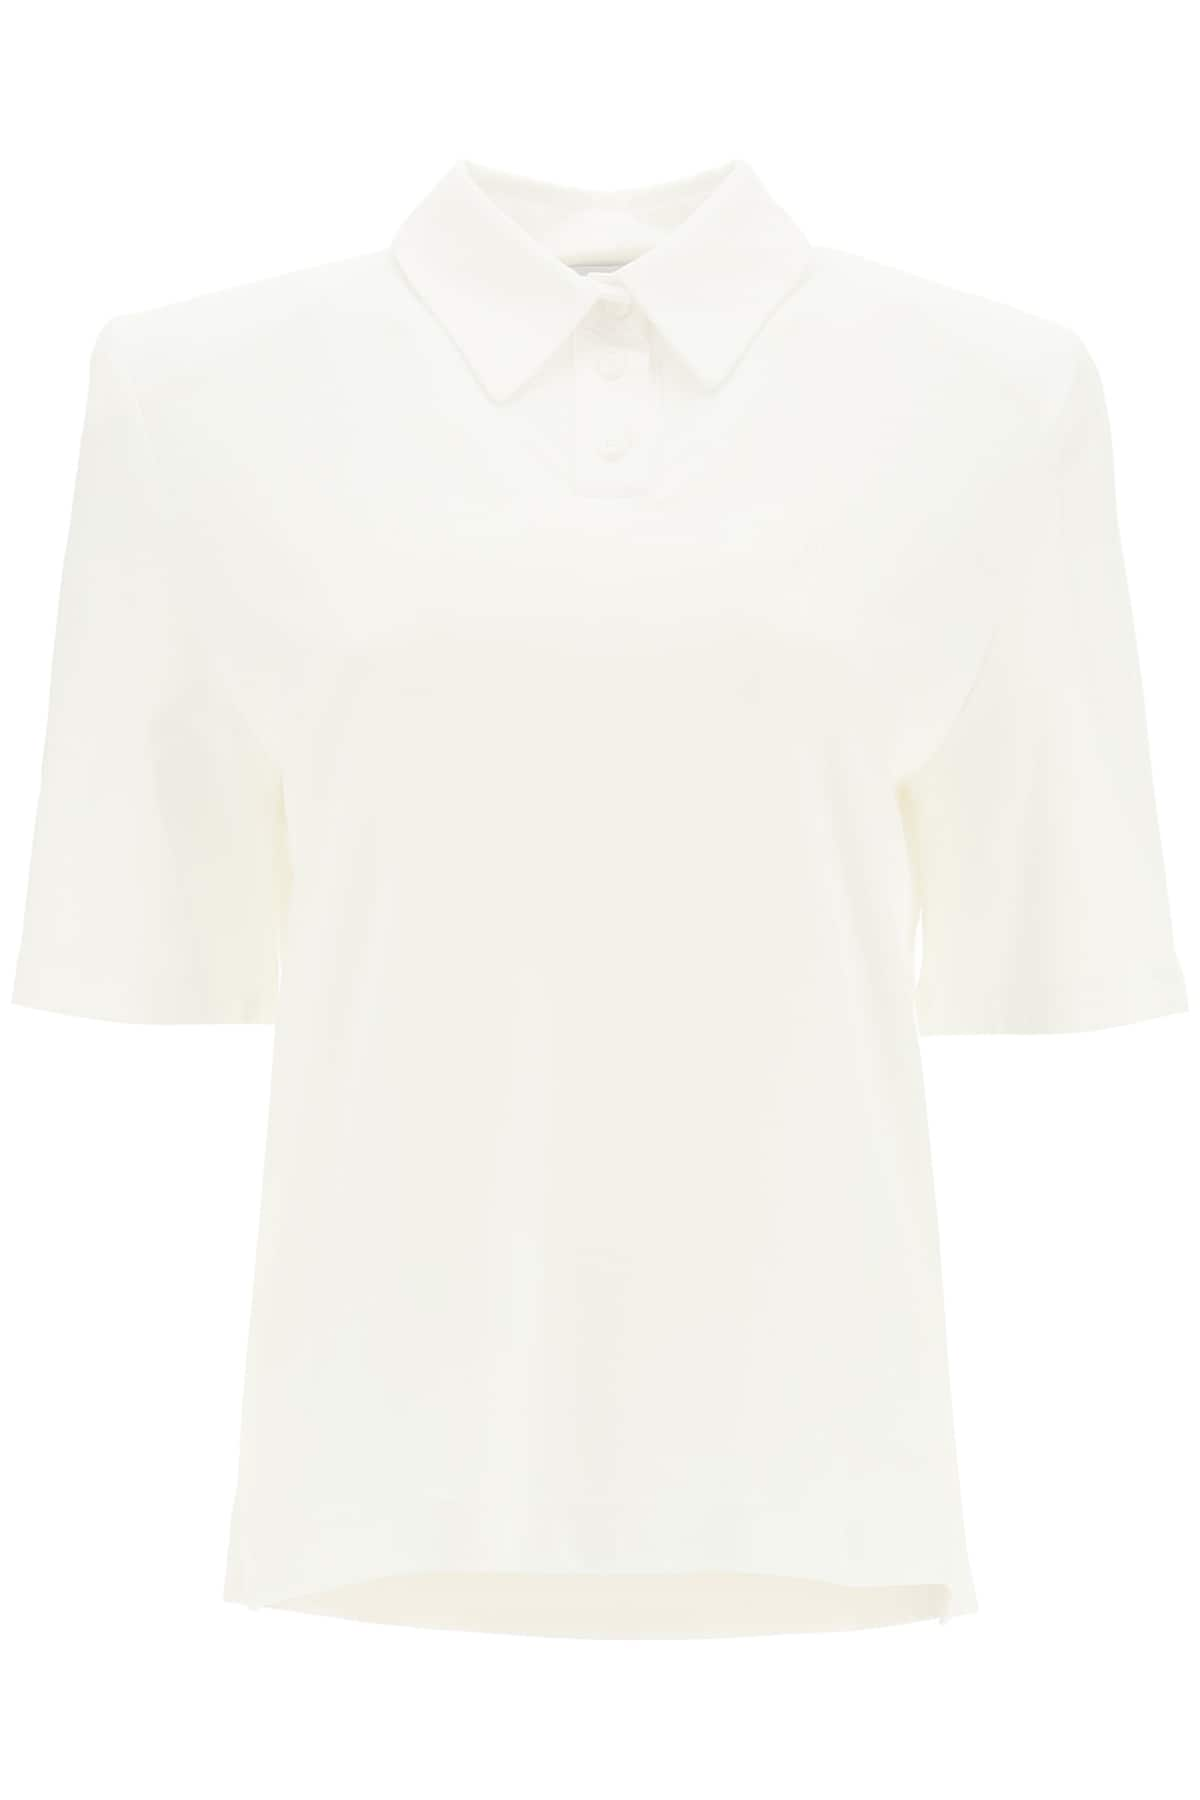 THE ATTICO ASTRID POLO SHIRT WITH LOGO EMBROIDERY 42 White Cotton